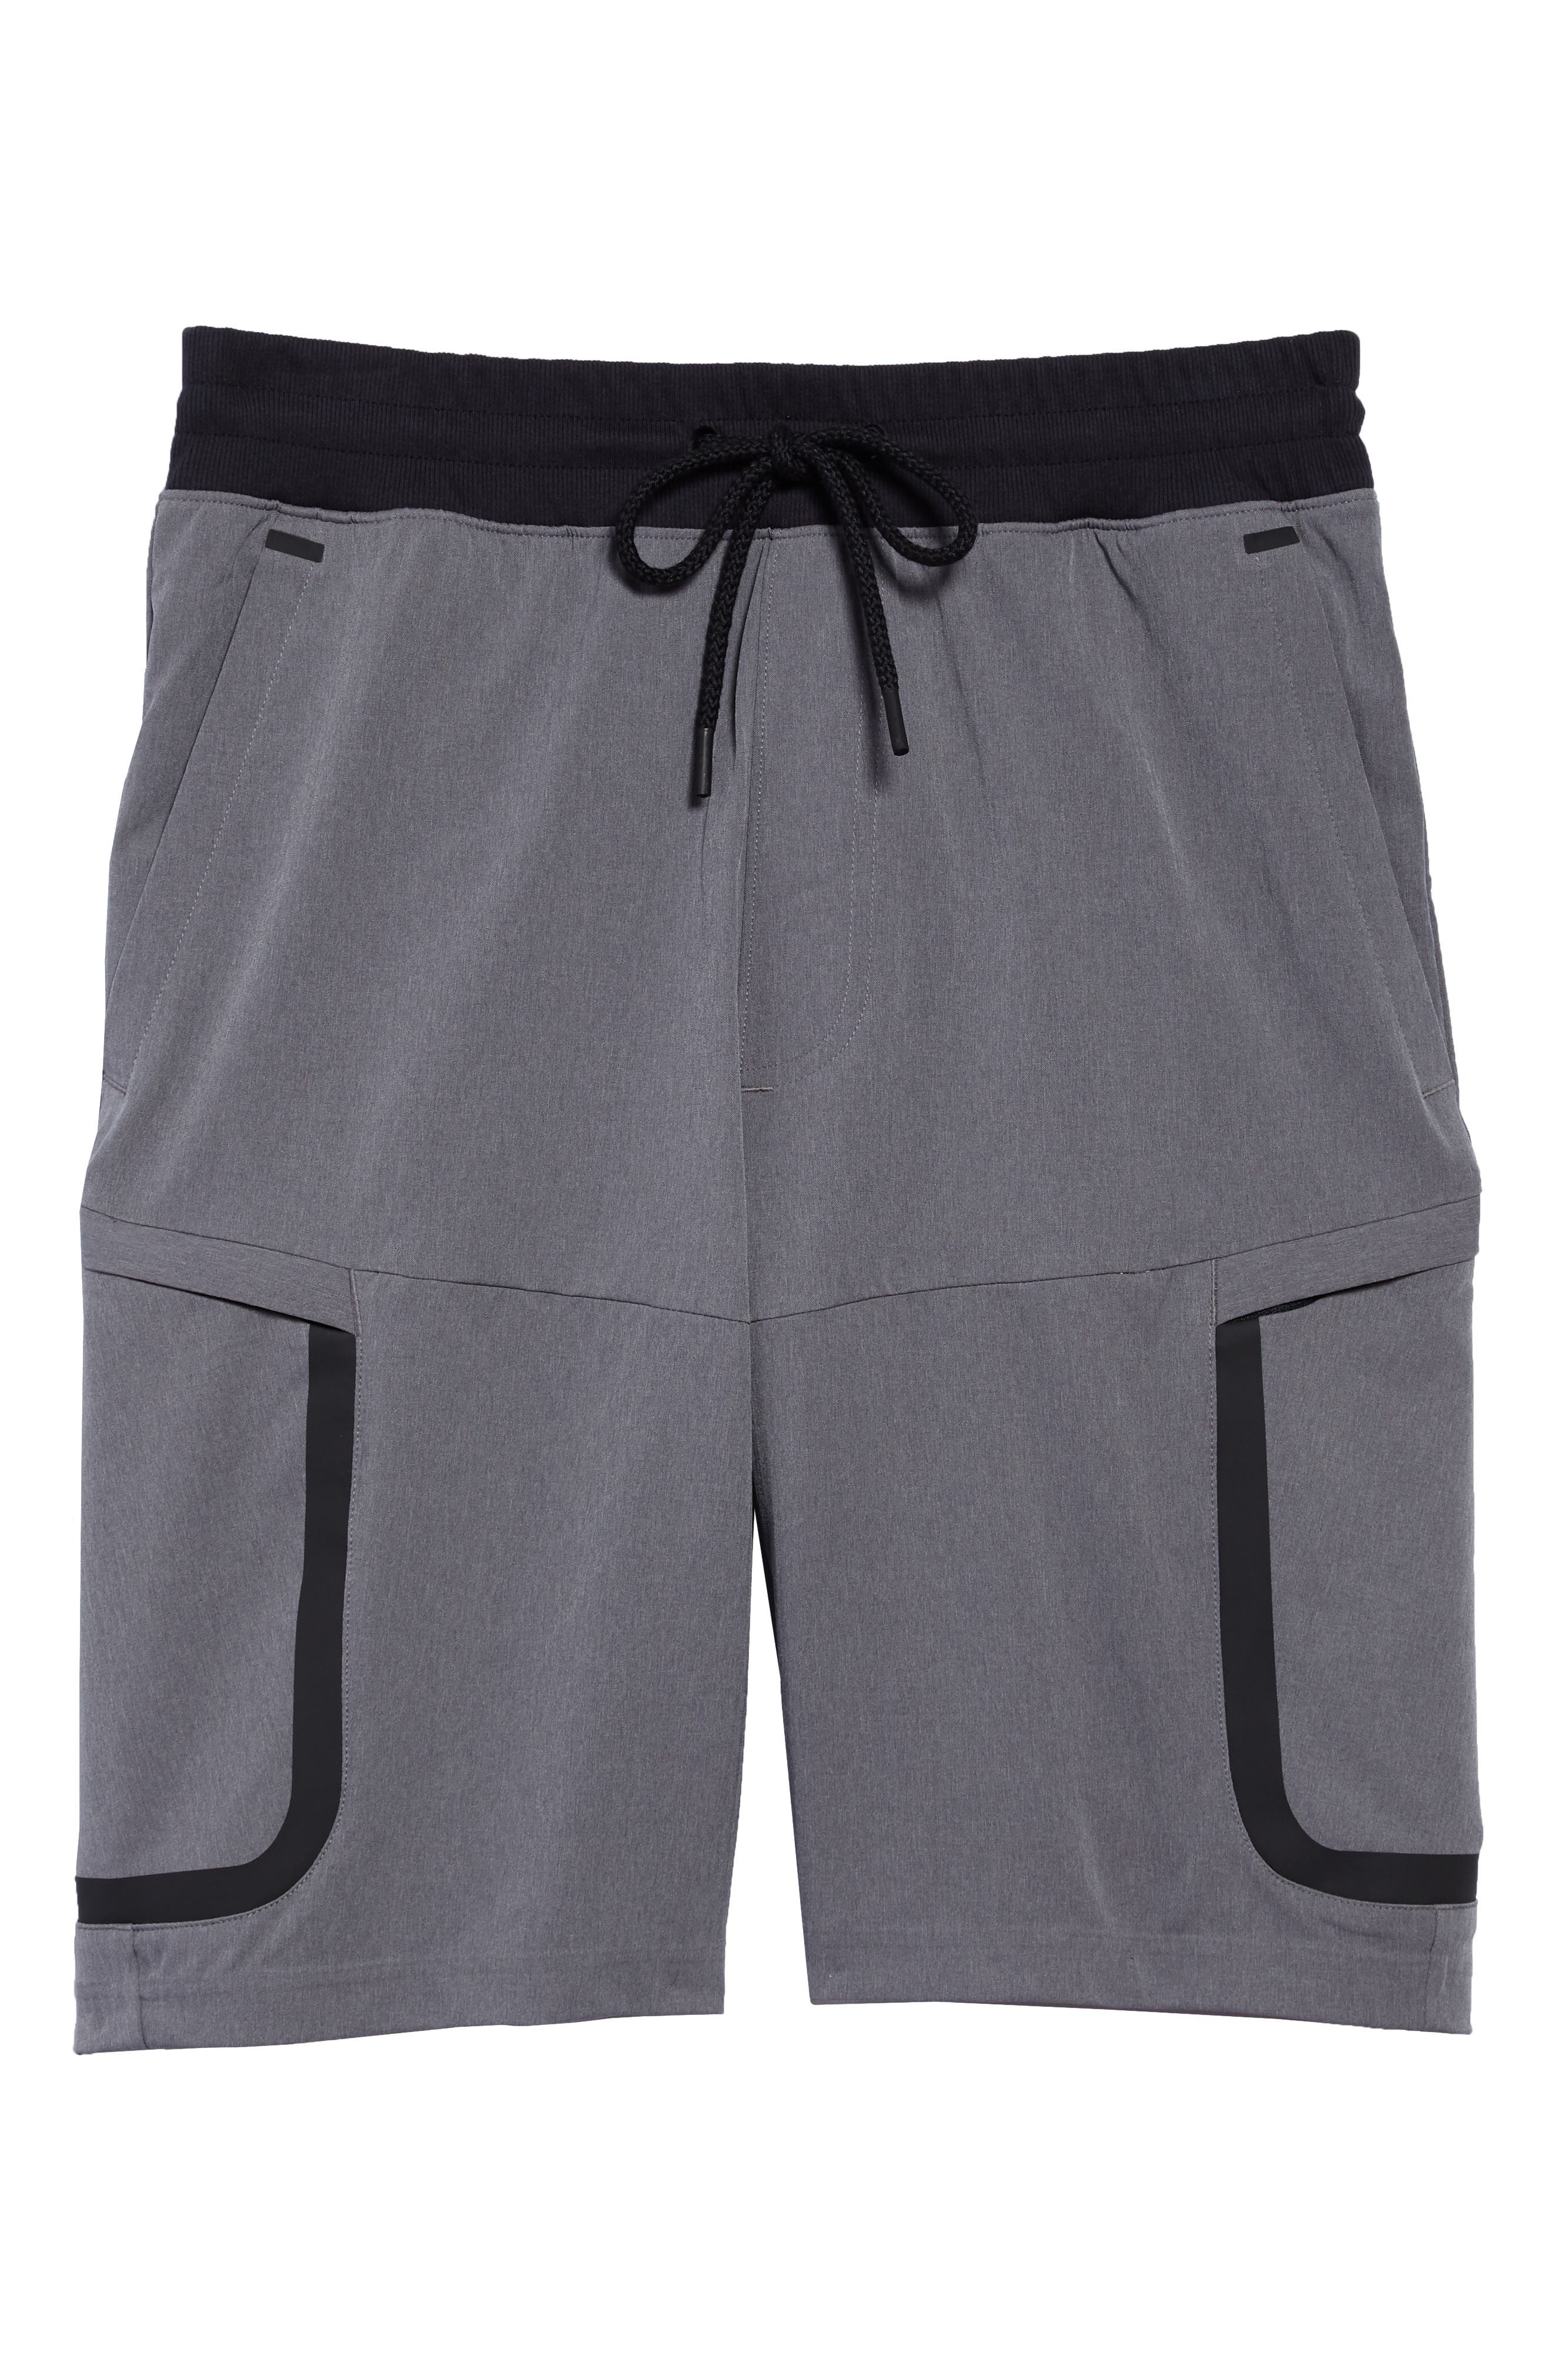 Sportstyle Elite Cargo Shorts,                             Alternate thumbnail 6, color,                             STEEL FULL HEATHER / / BLACK